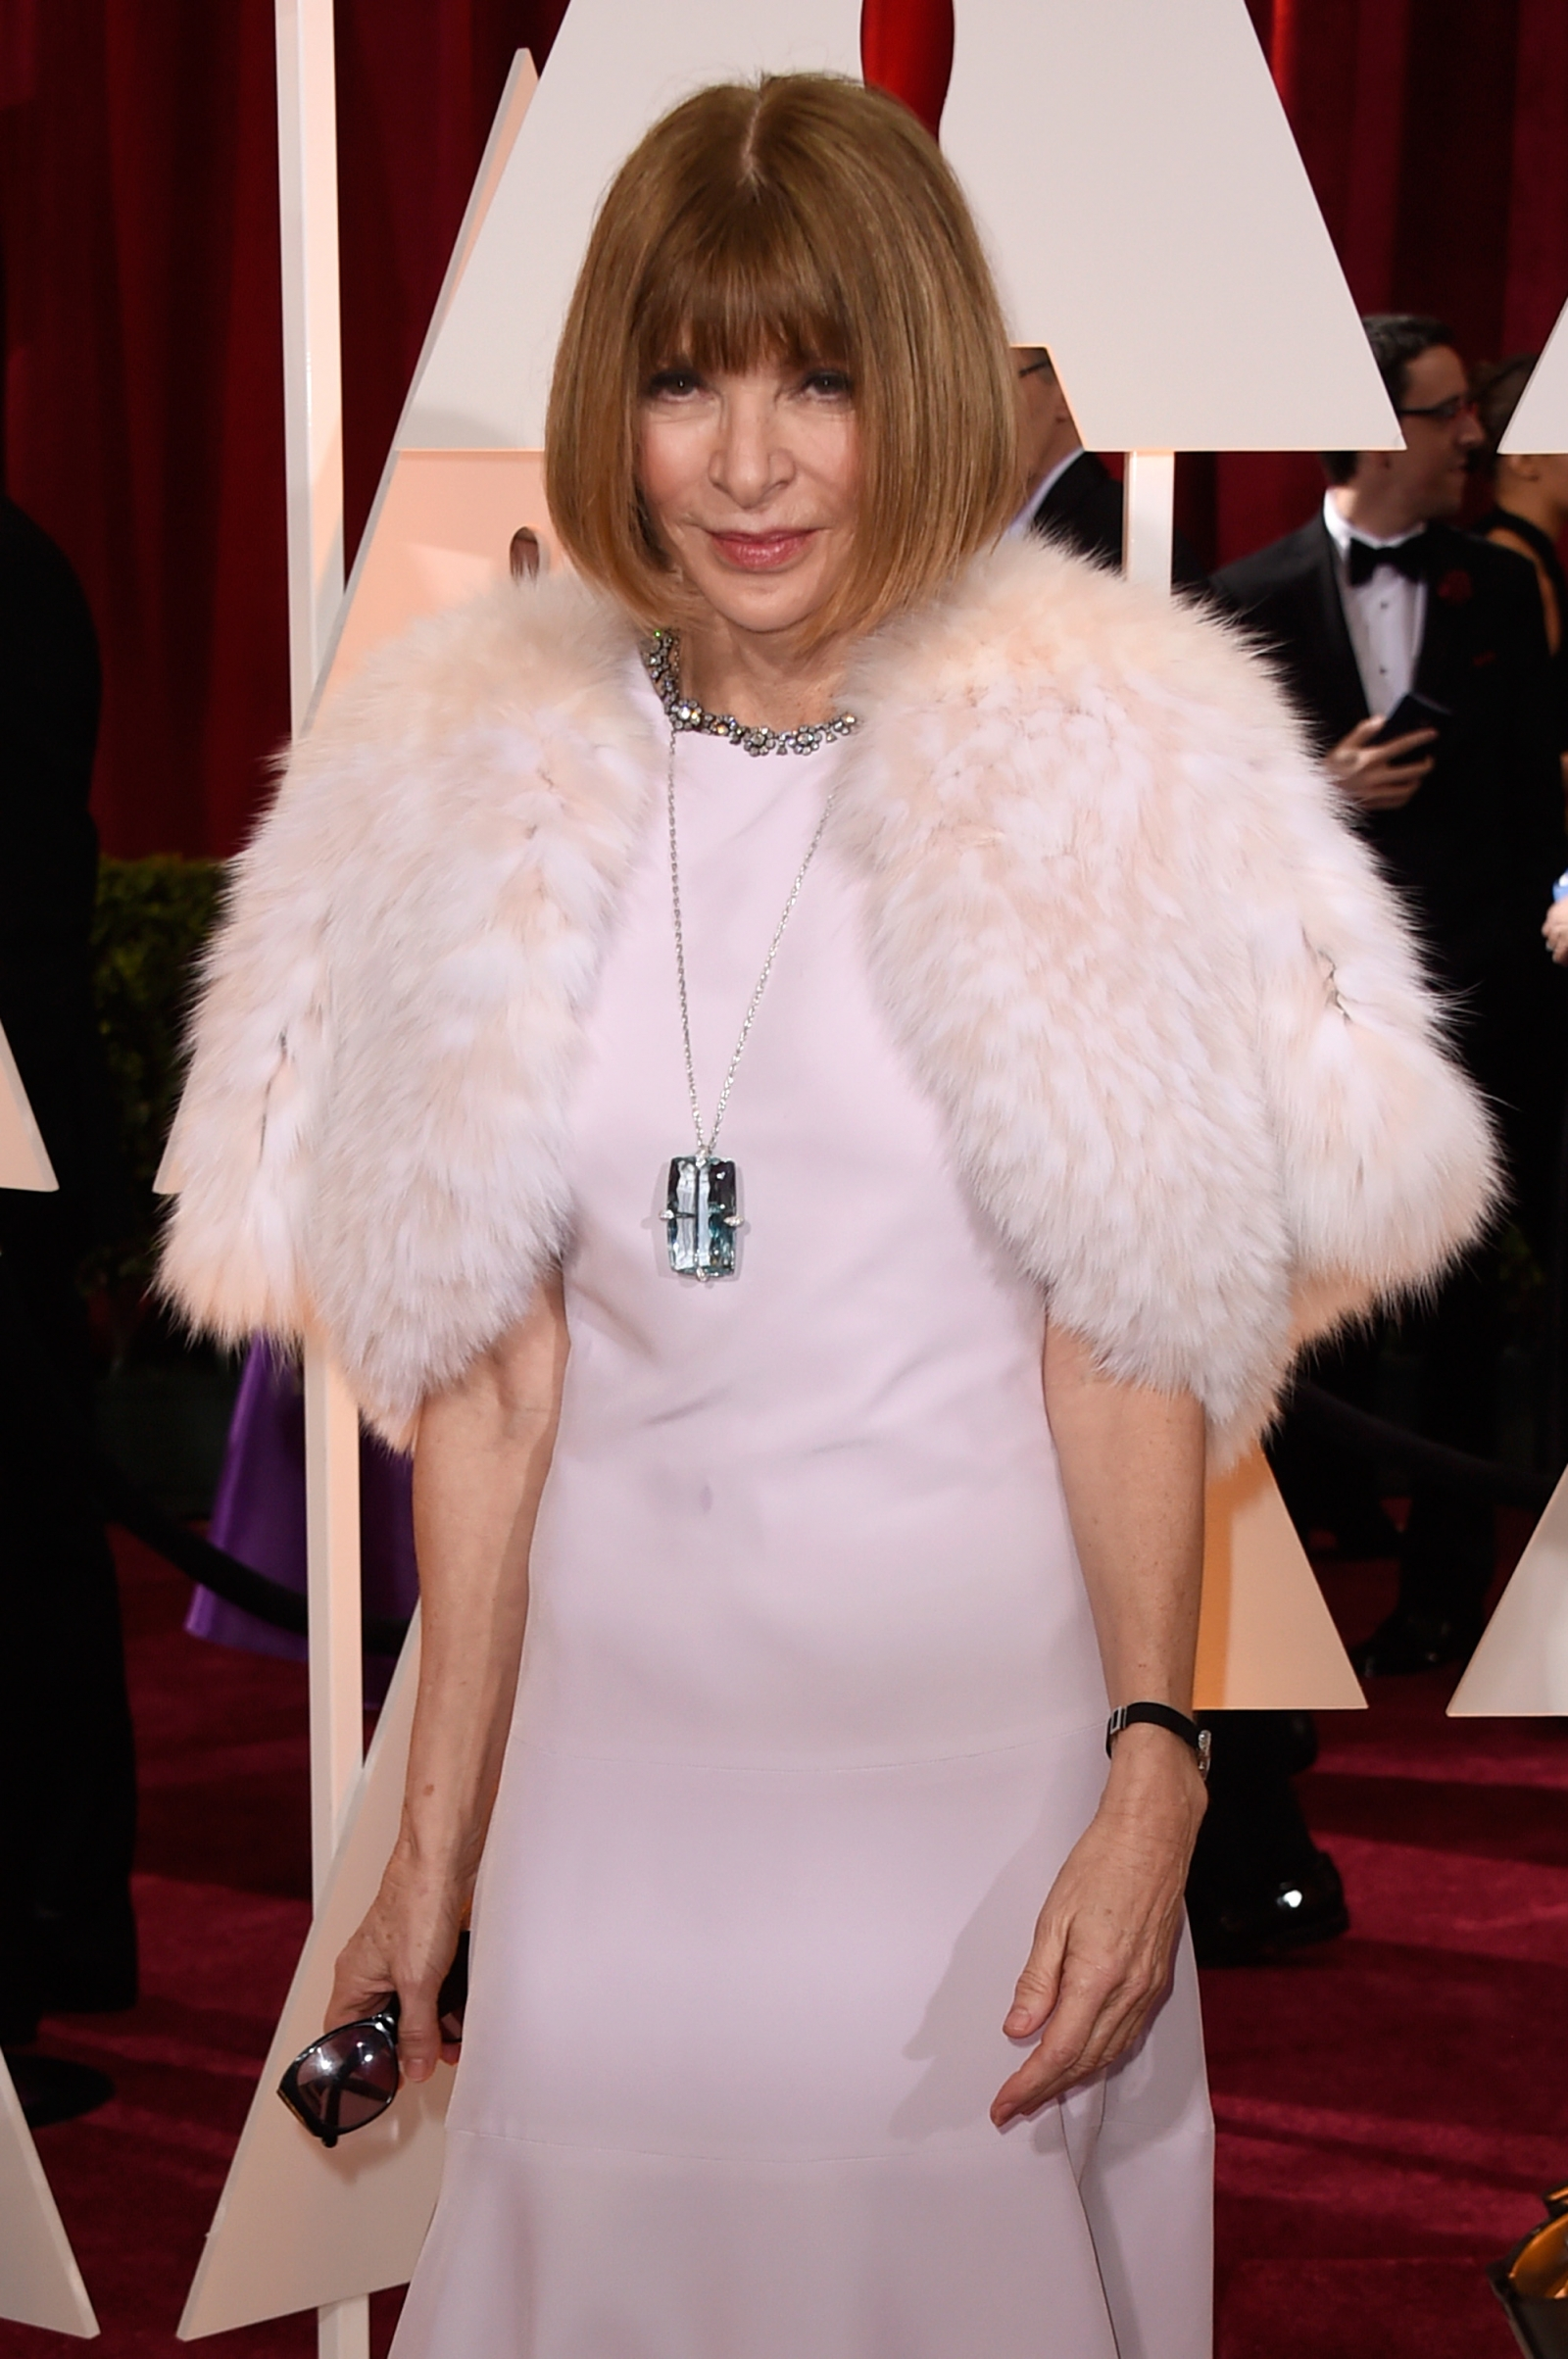 Oscars 2015 Anna Wintour Slammed As Diva For Refusing